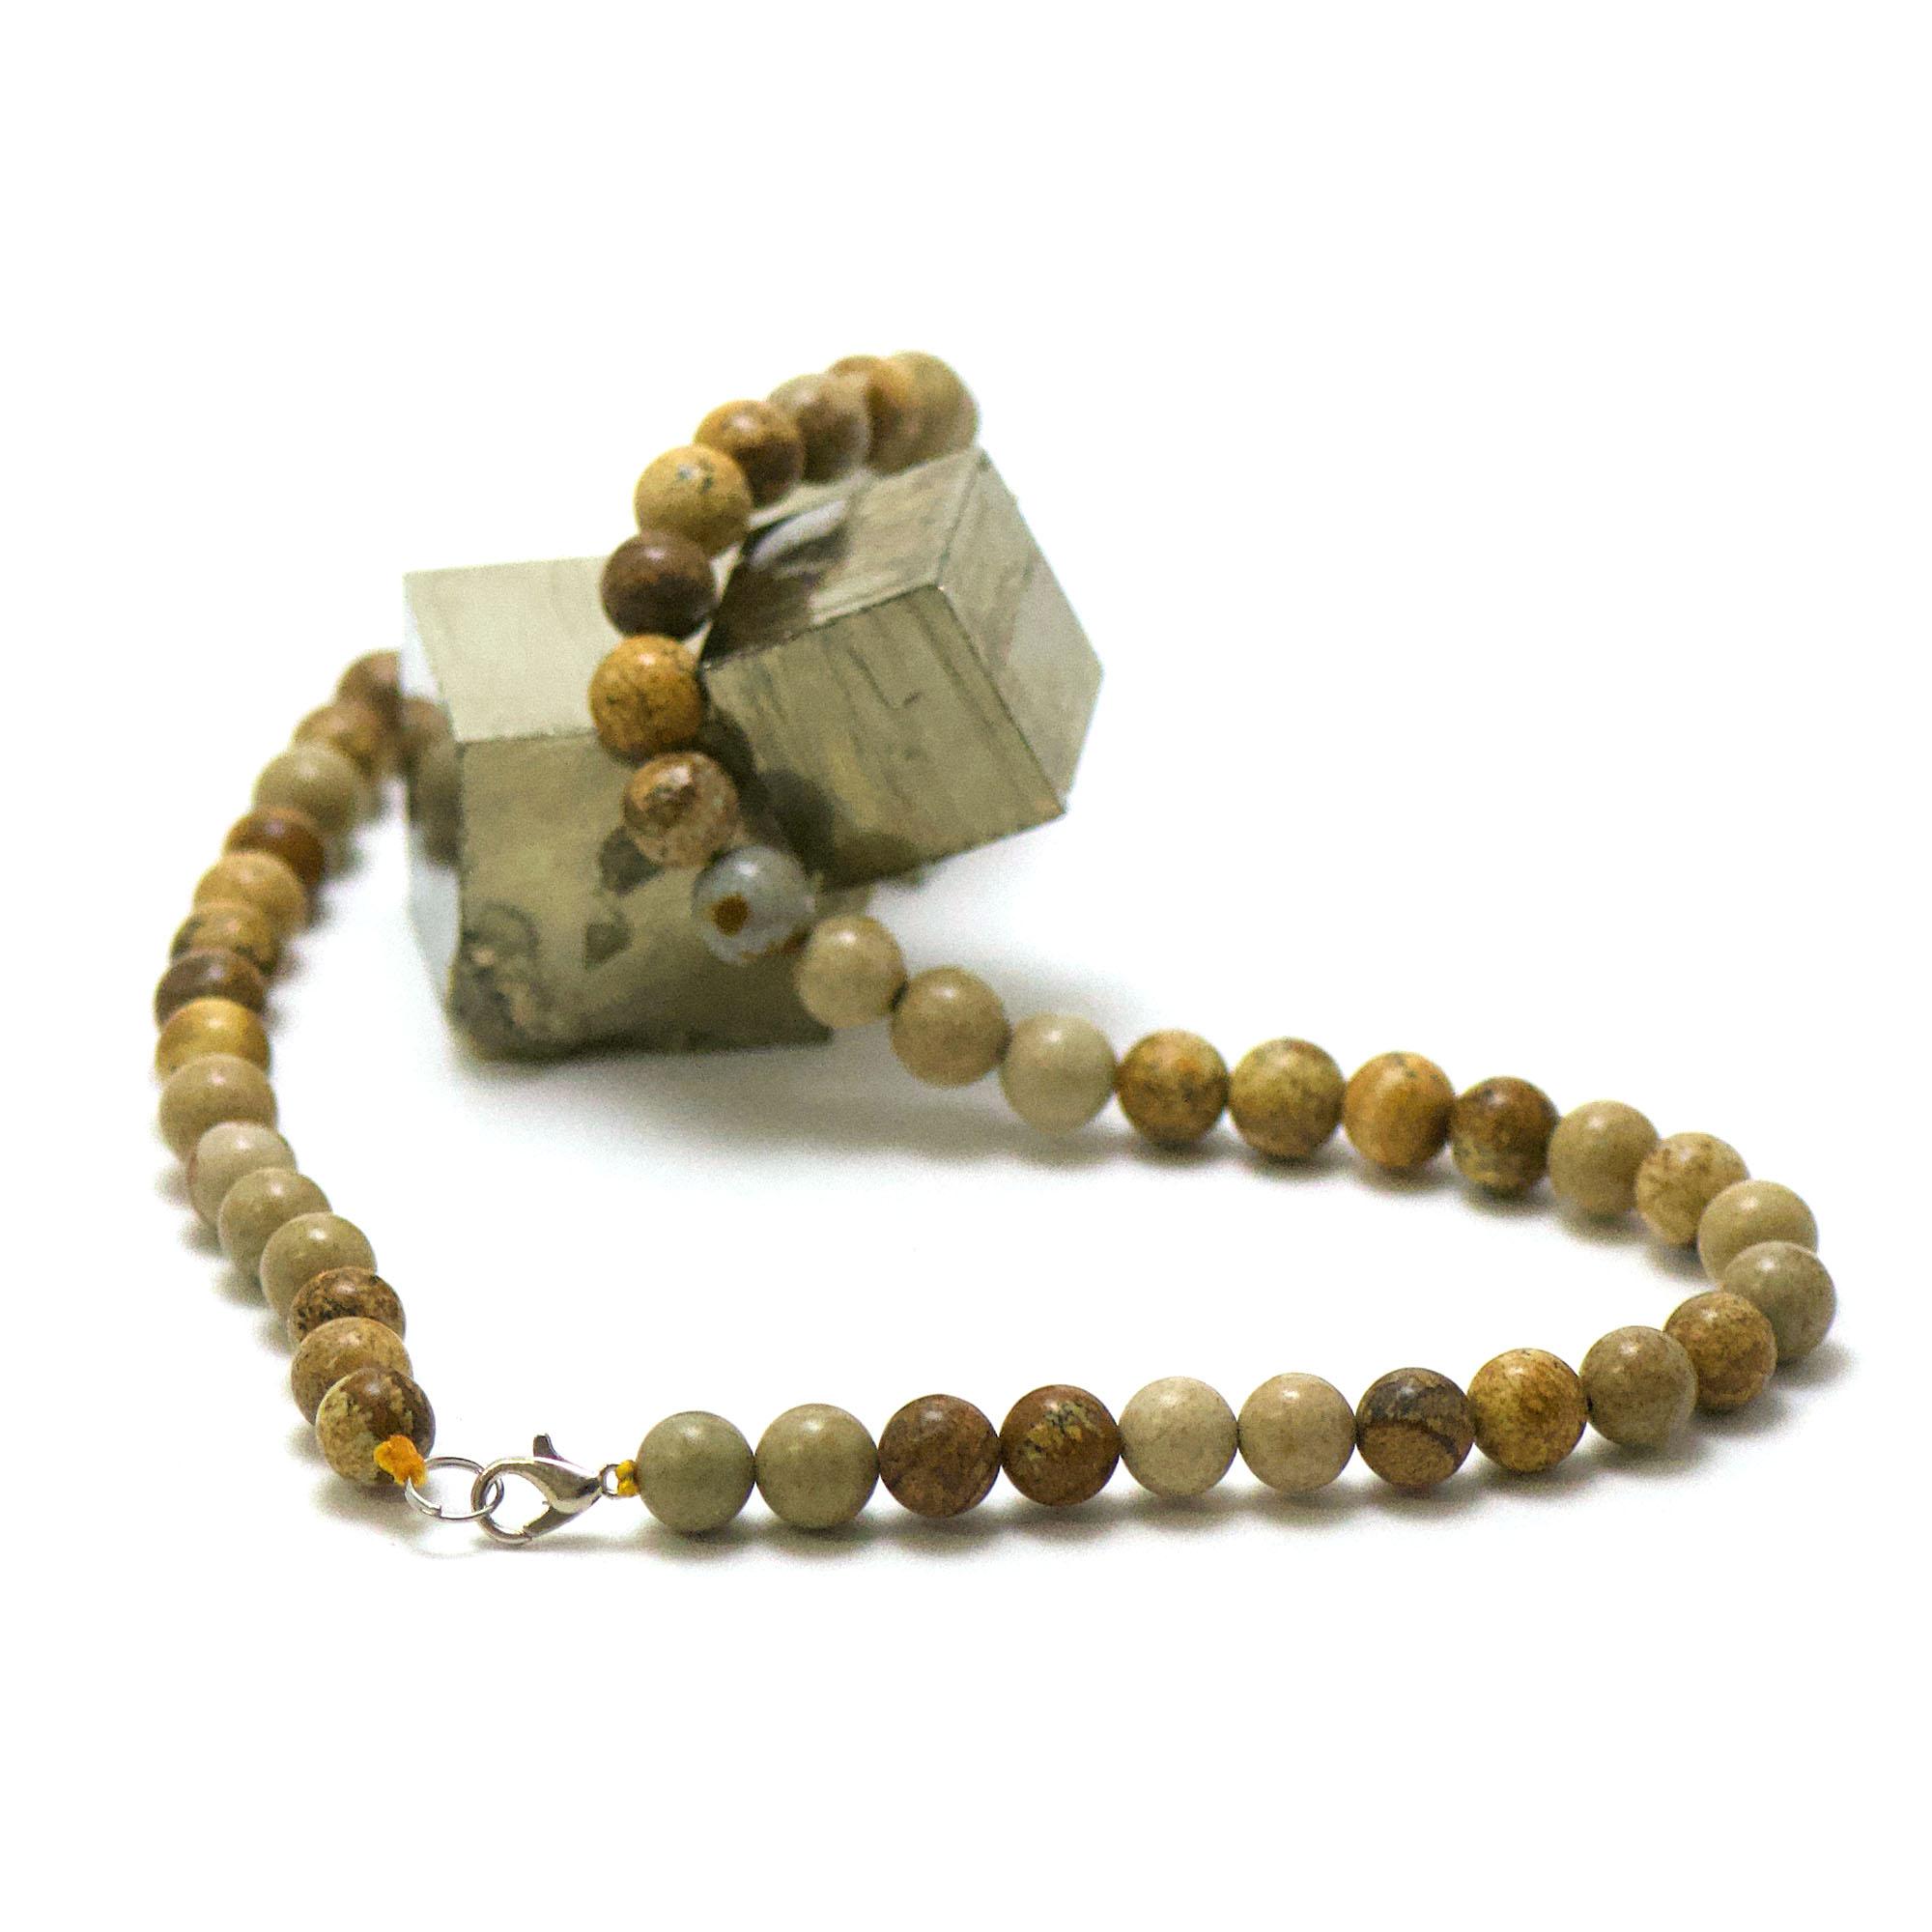 collier en jaspe paysage, perle ronde 8 mm